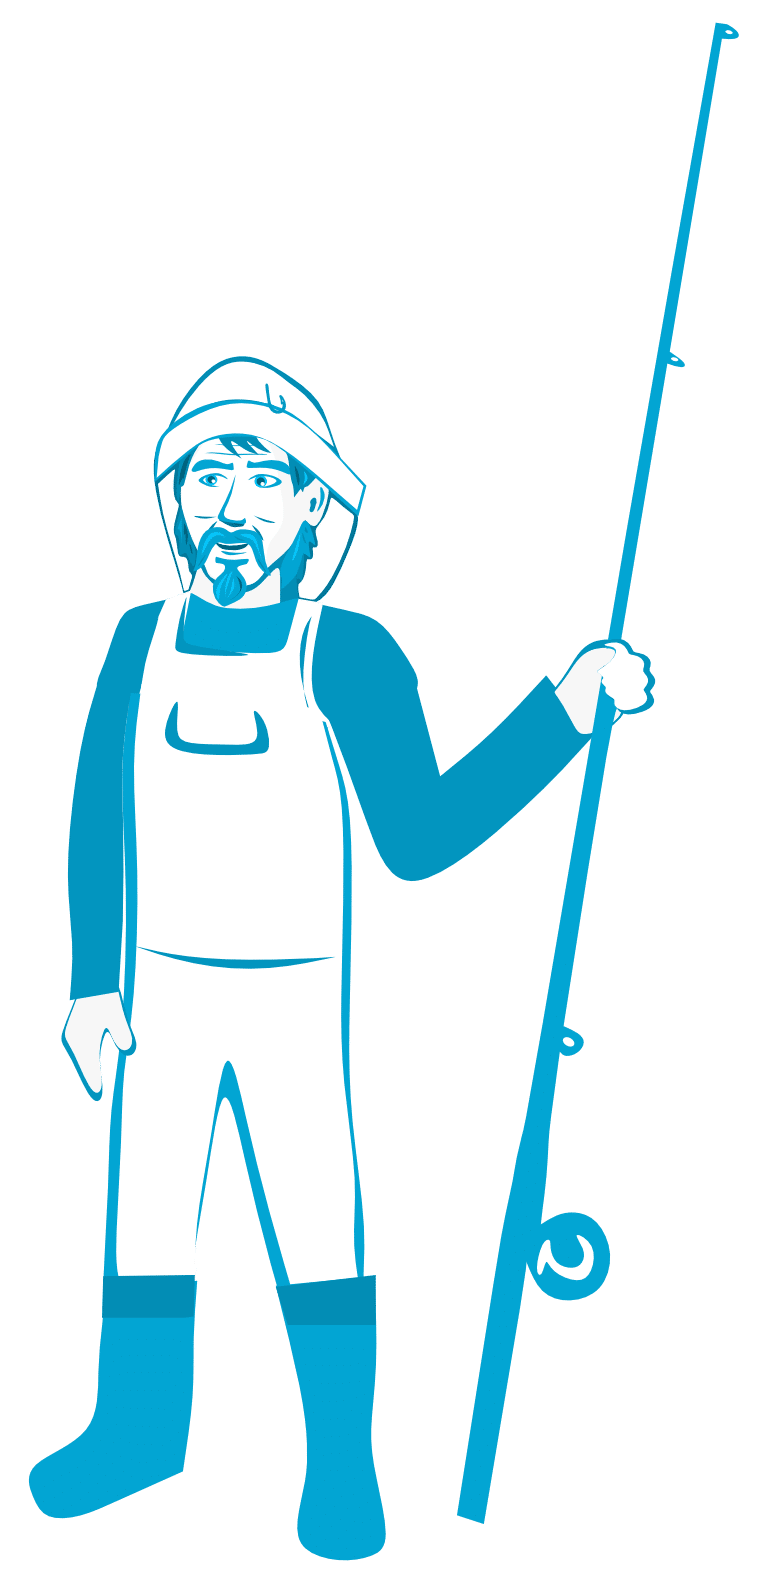 Stehender Angler mit Rute